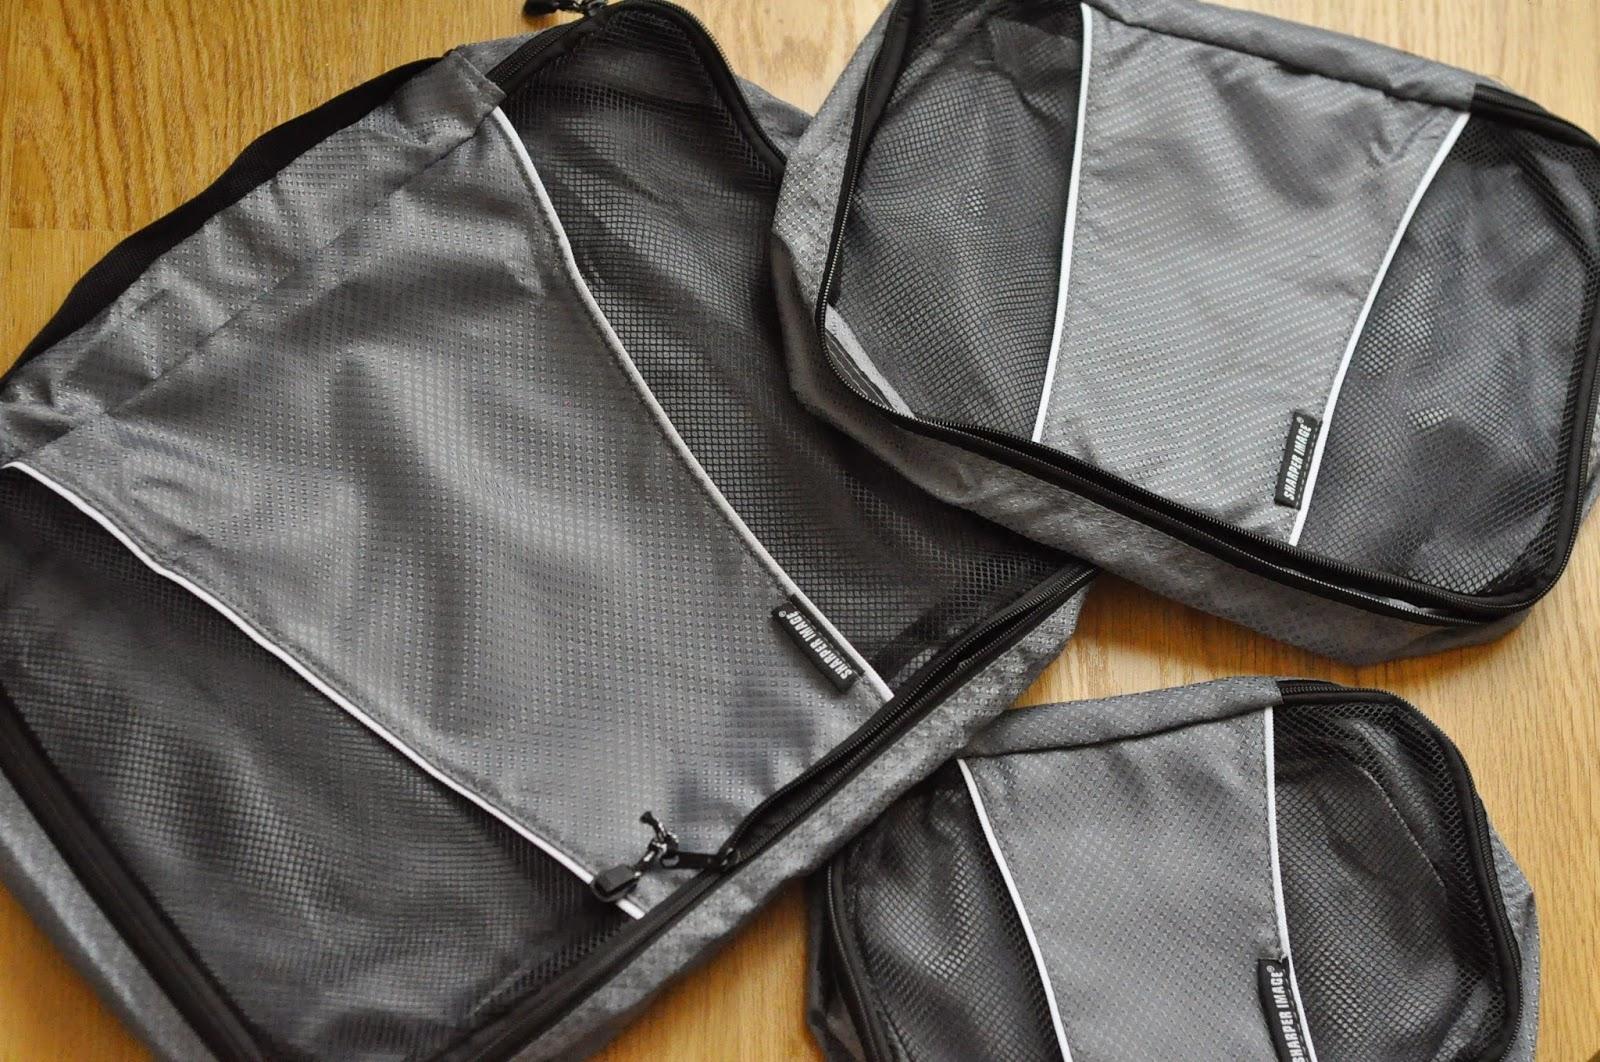 packing cubes - seyahat organizatorleri - valiz duzenleme